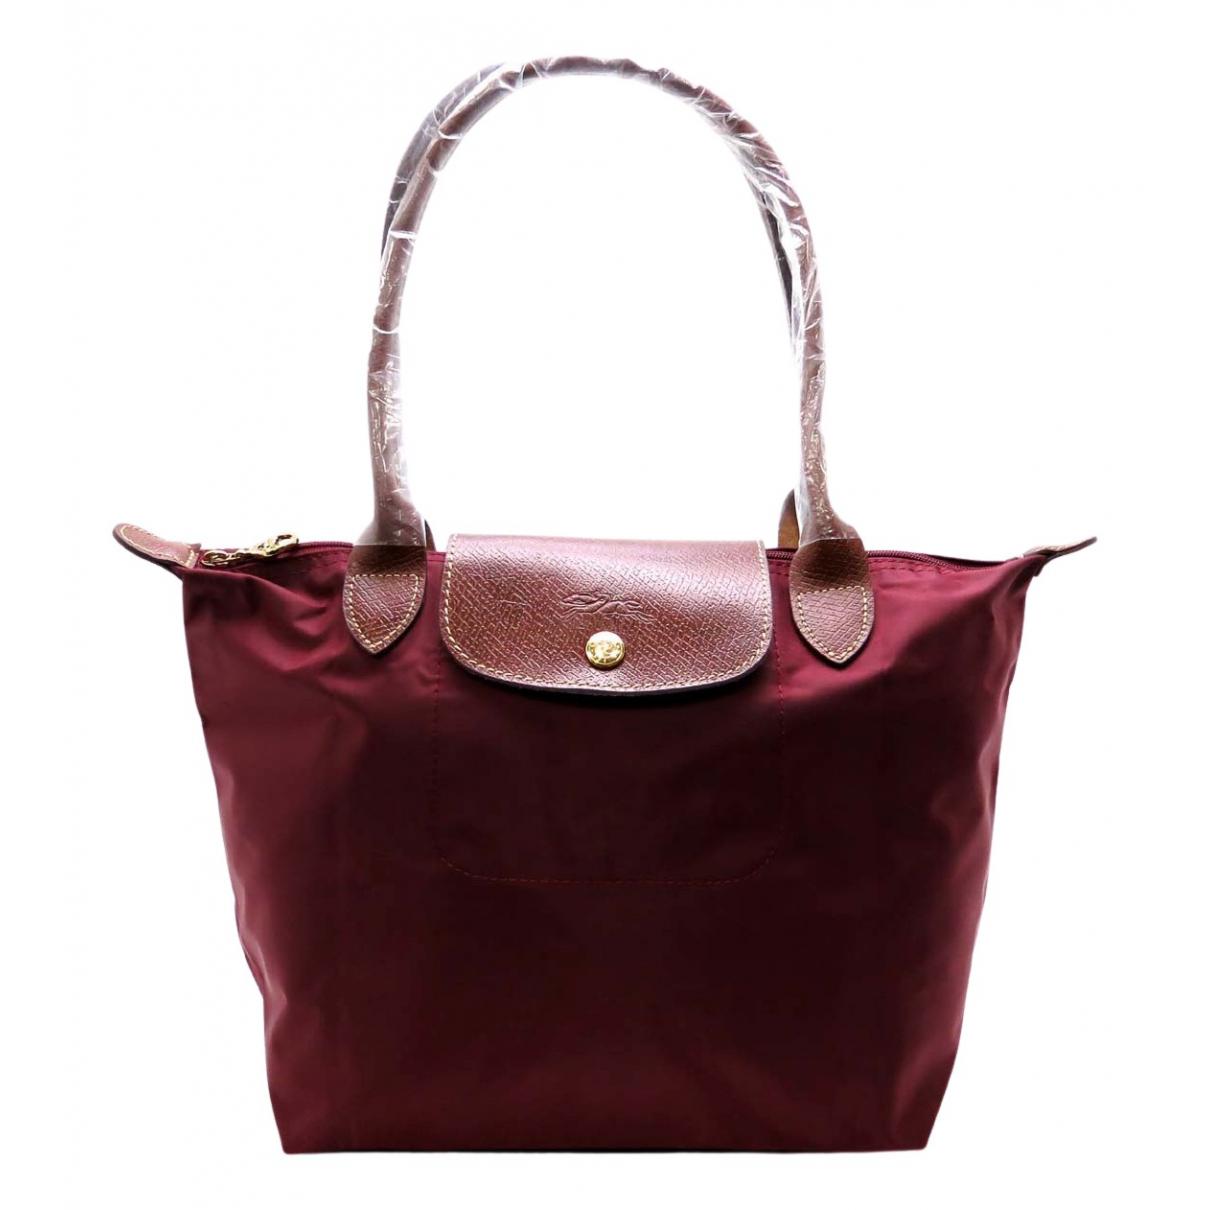 Longchamp N Red Cloth handbag for Women N